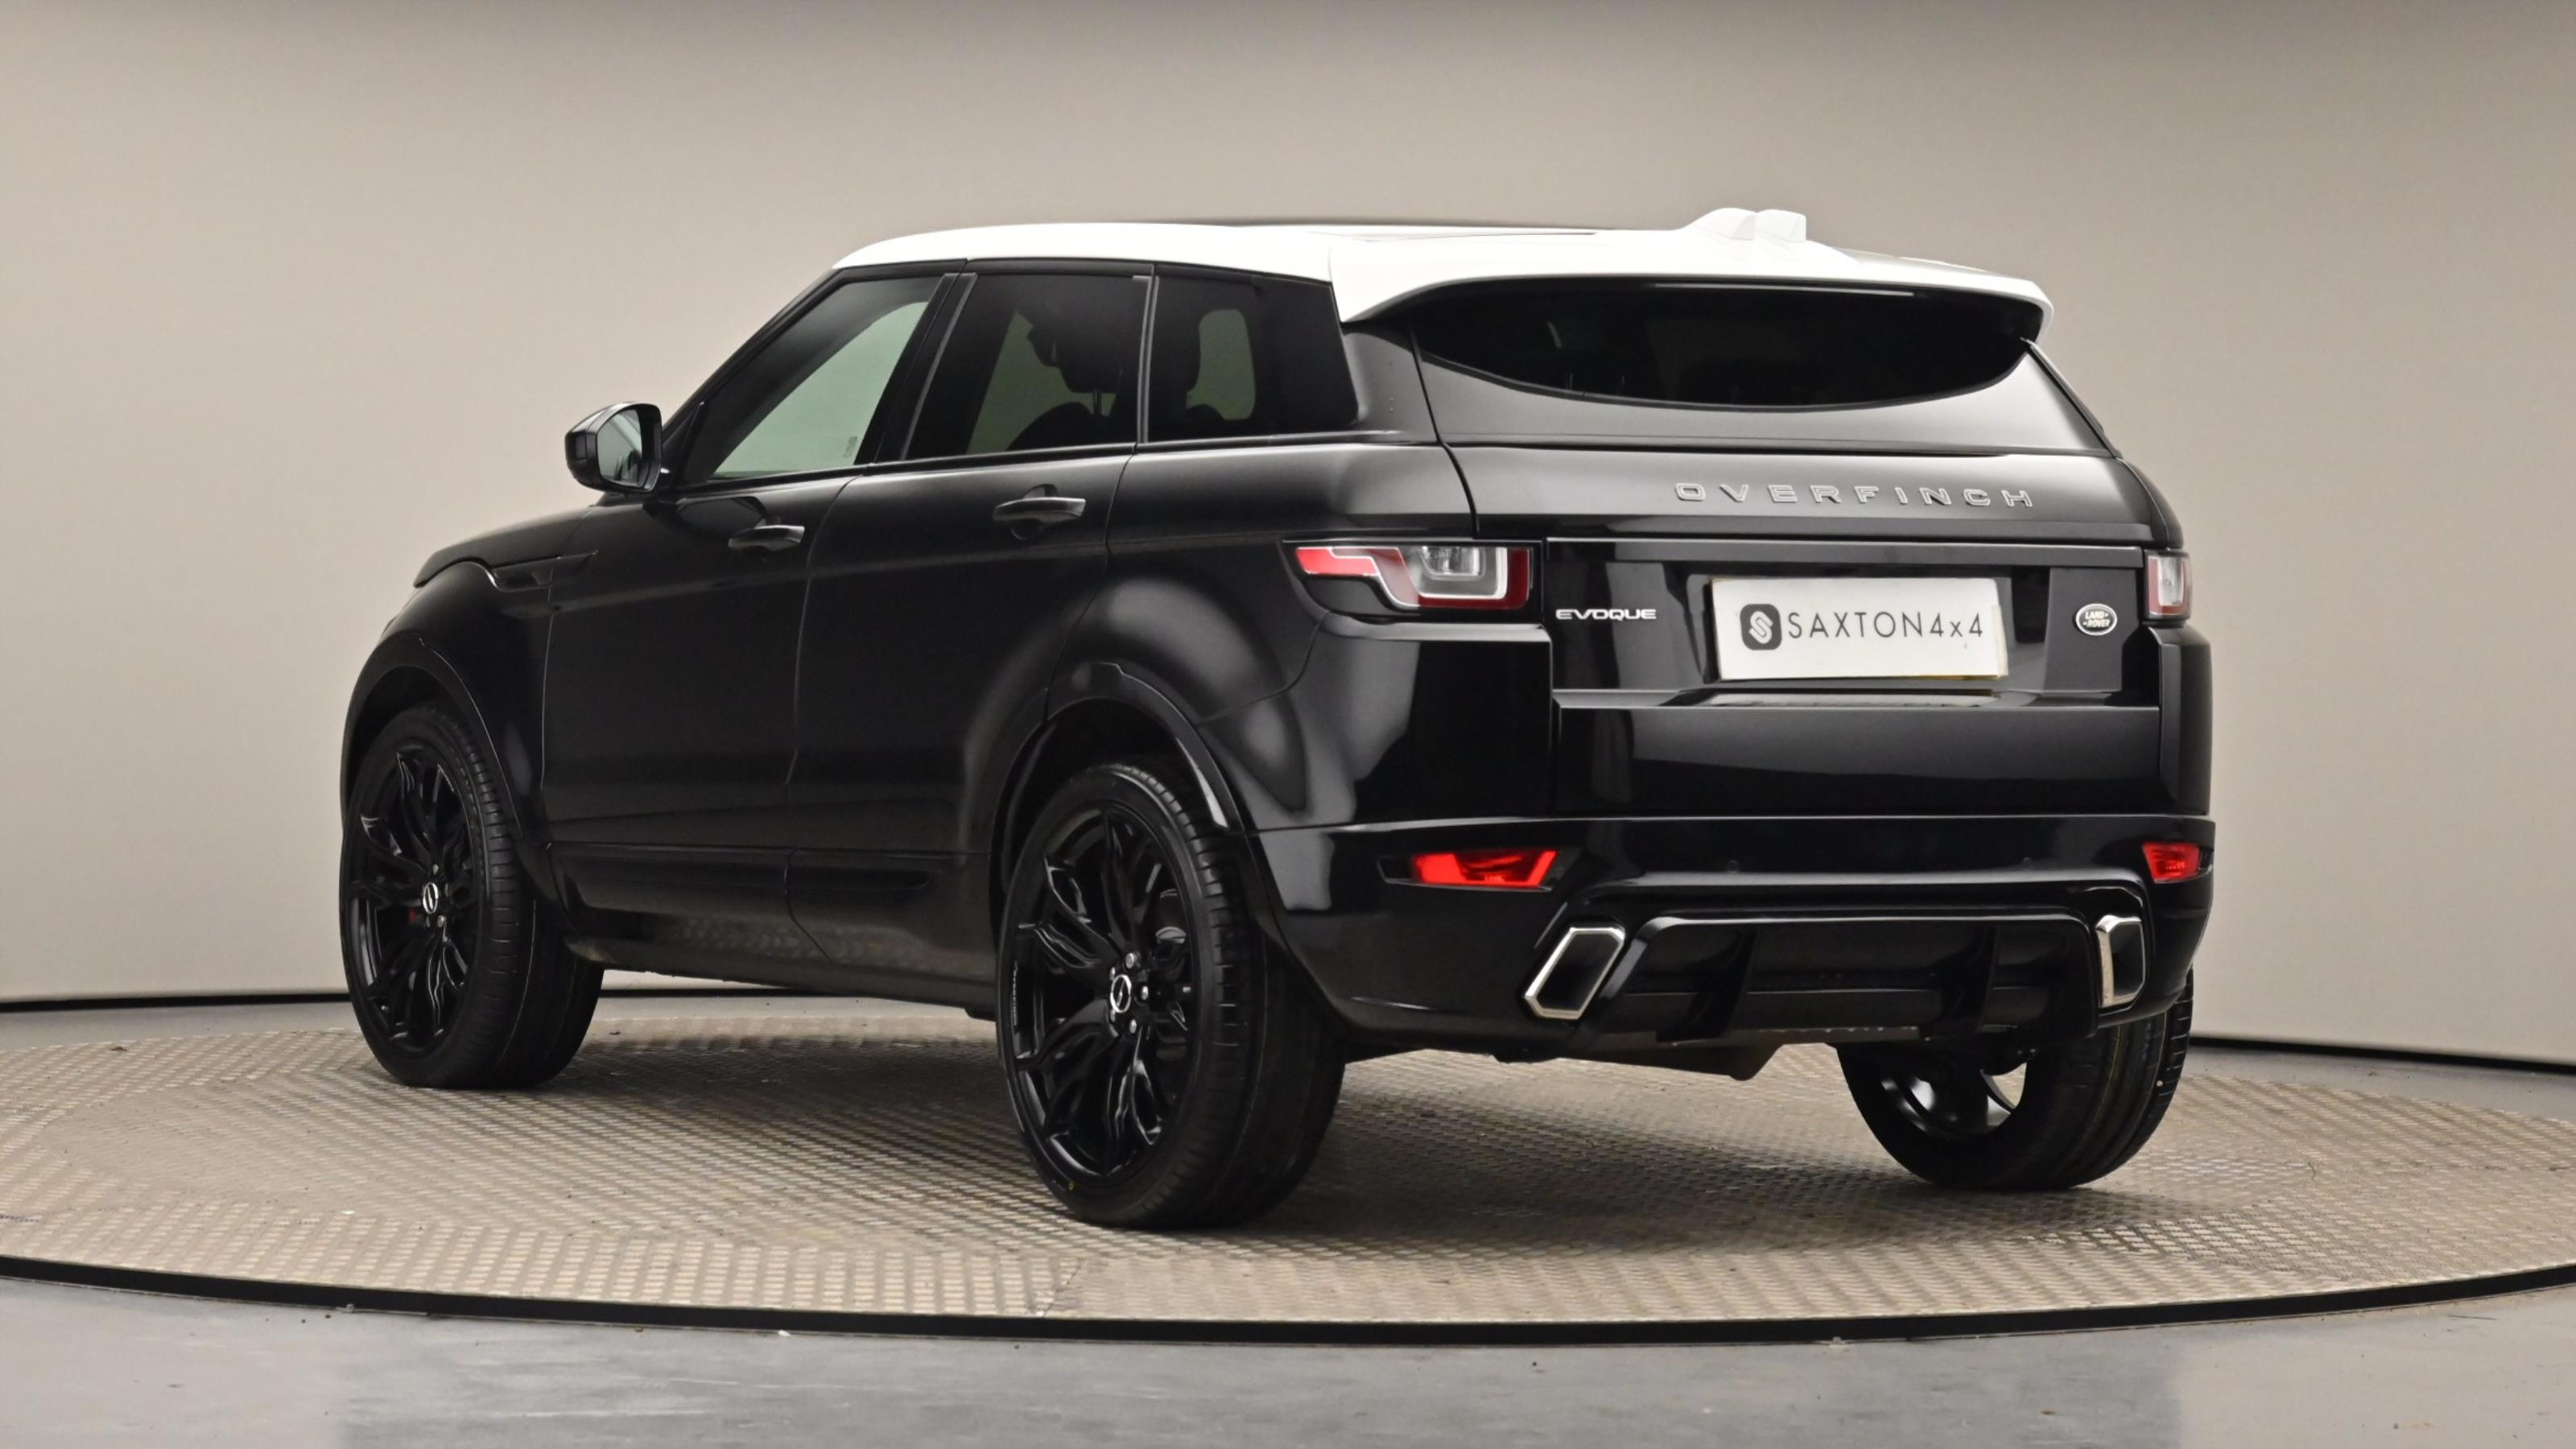 Used 15 Land Rover RANGE ROVER EVOQUE 2.0 TD4 SE Tech 5dr Auto Black at Saxton4x4